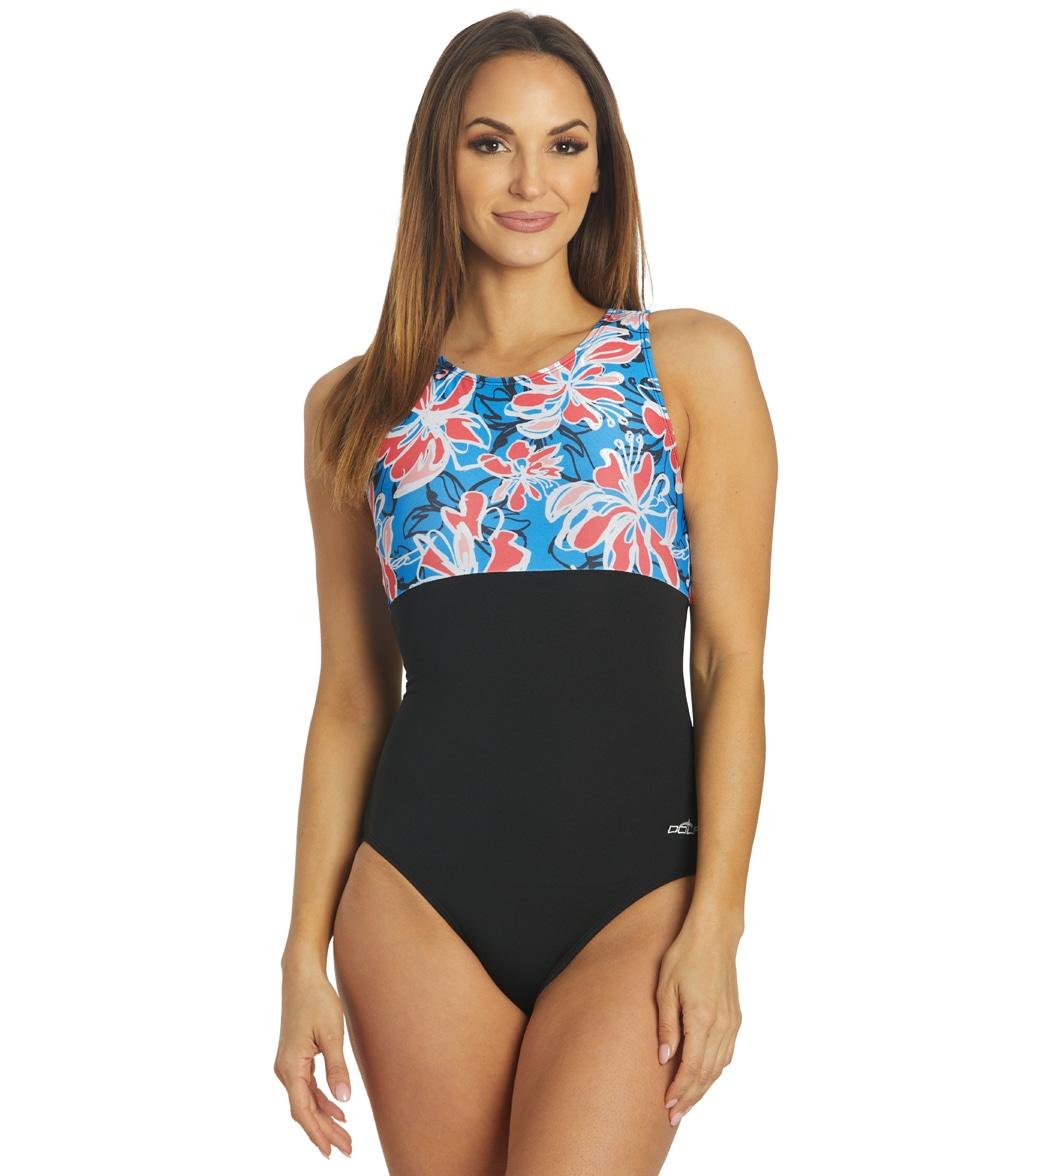 Dolfin Women's Aquashape Wildflowers Block High Neck Clasp Back One Piece Swimsuit